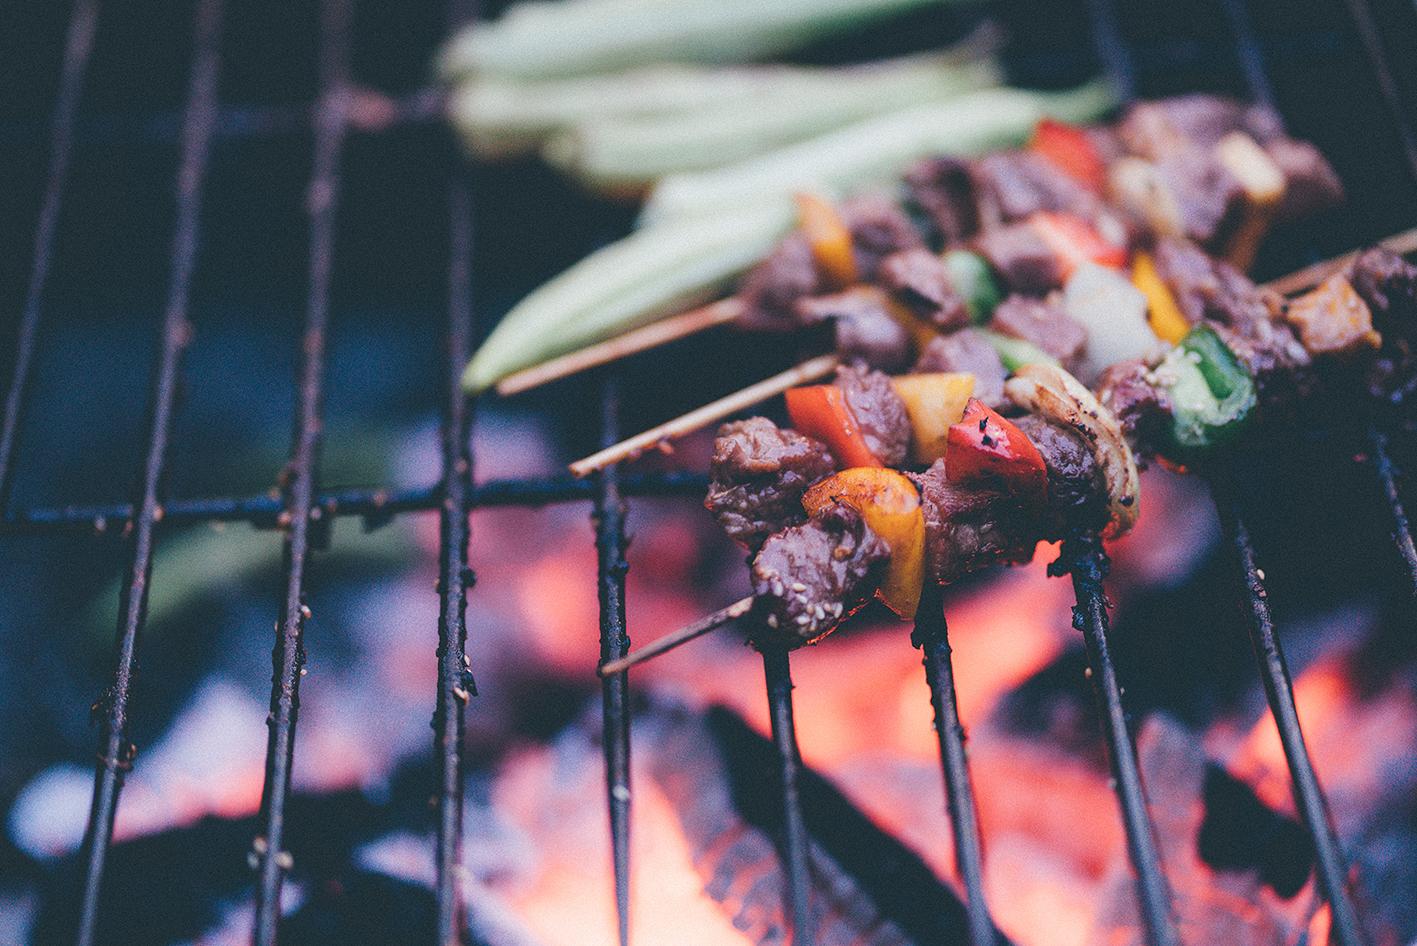 Word barbecue-master met de workshops van Fonteyn